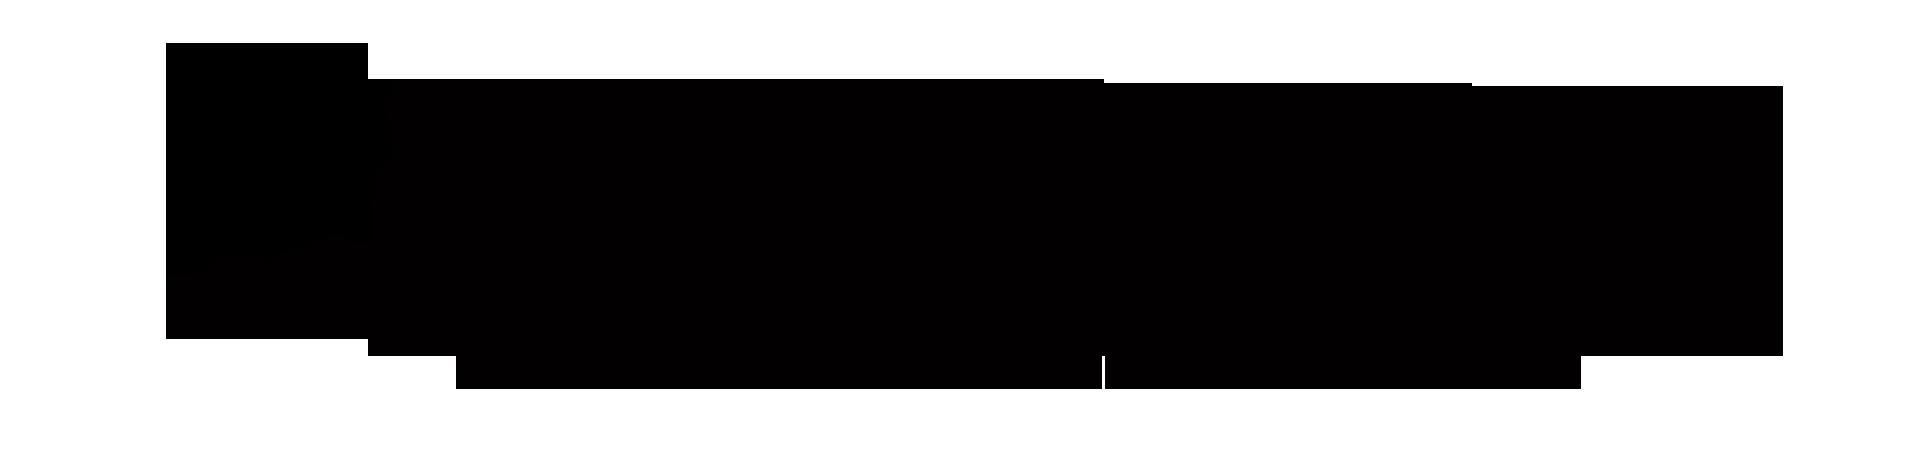 banner_grid_1